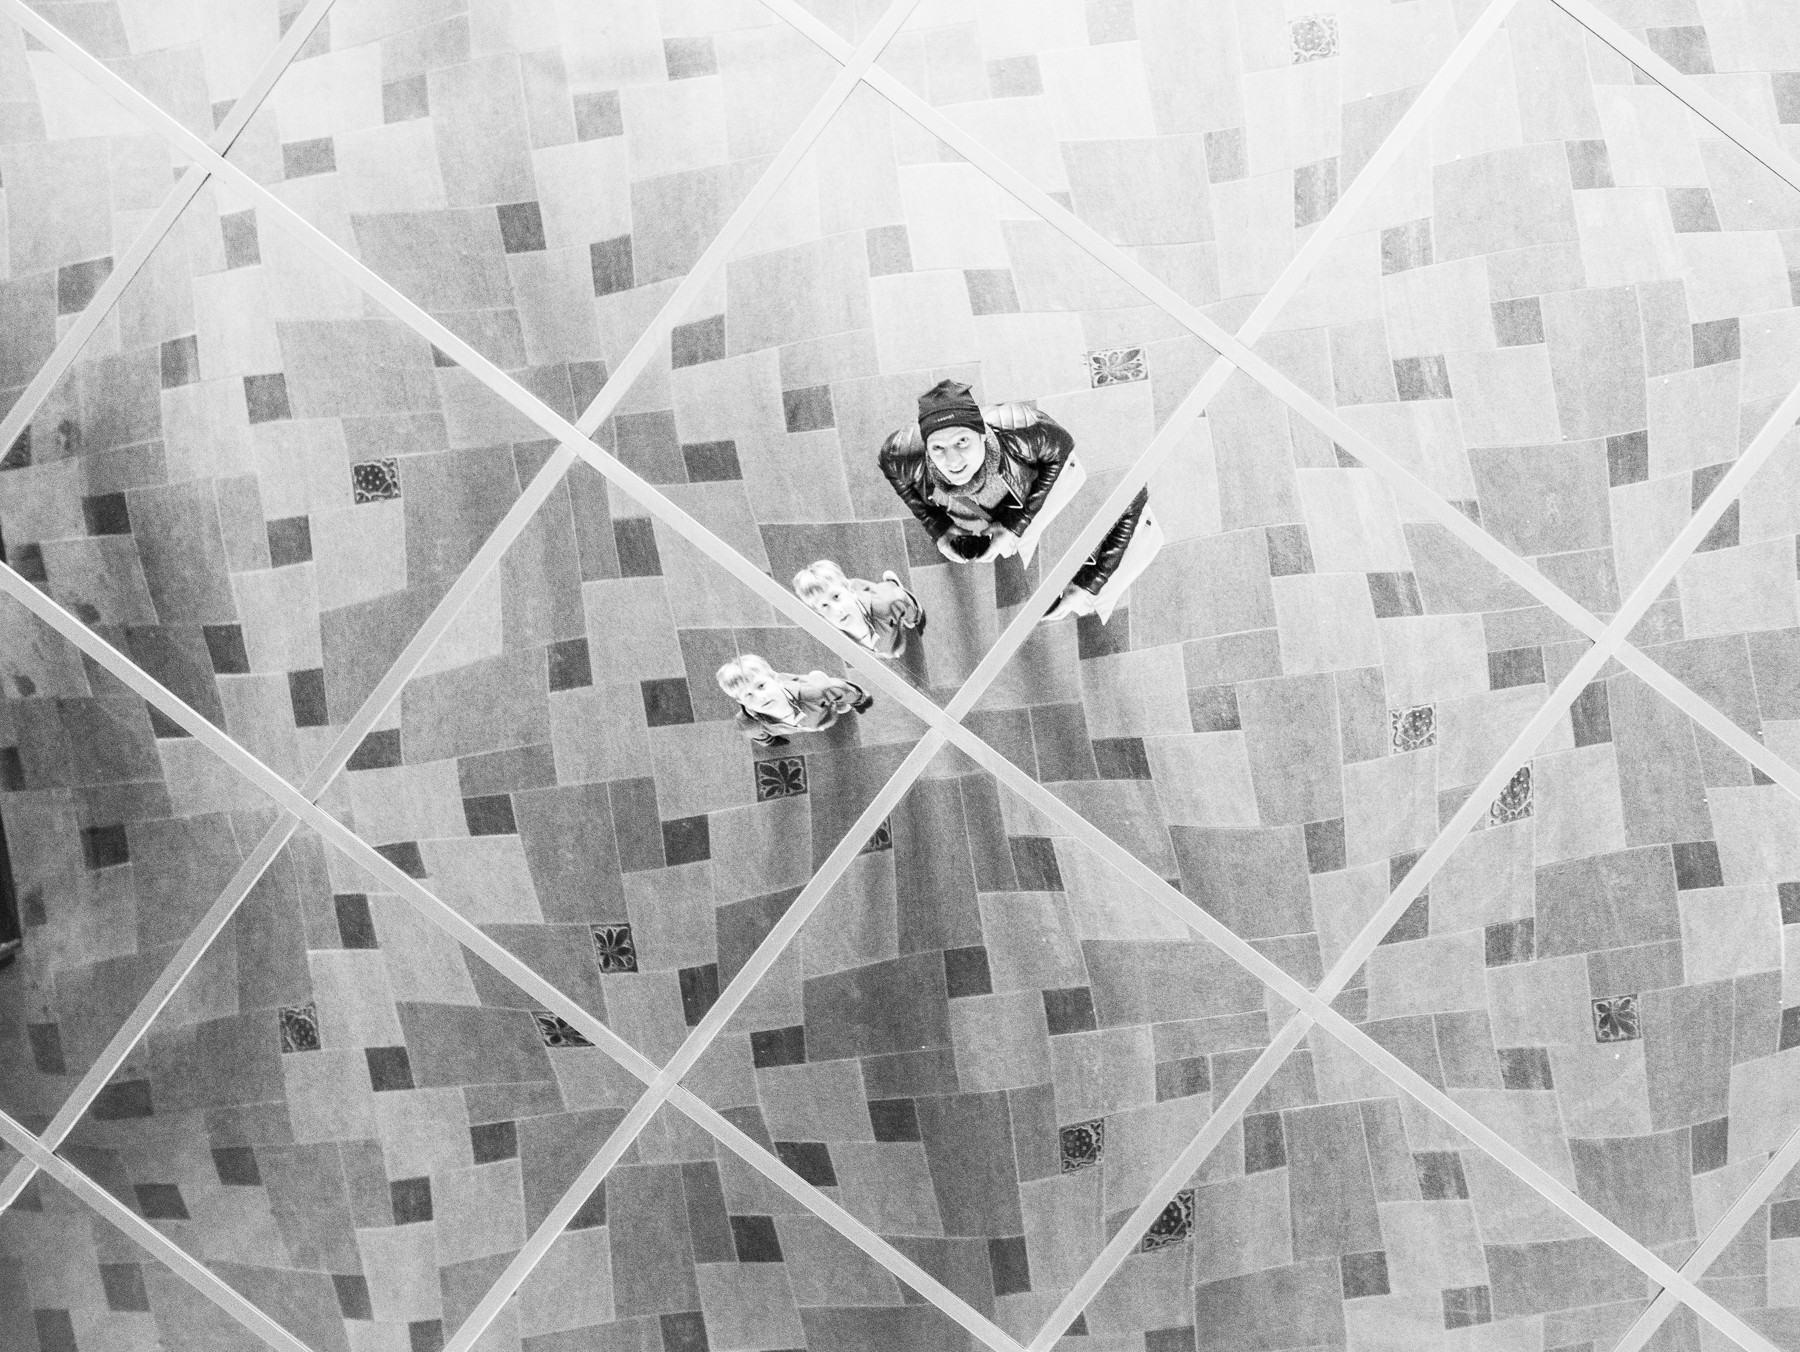 Lille spejl i loftet der... Halloween i Tivoli